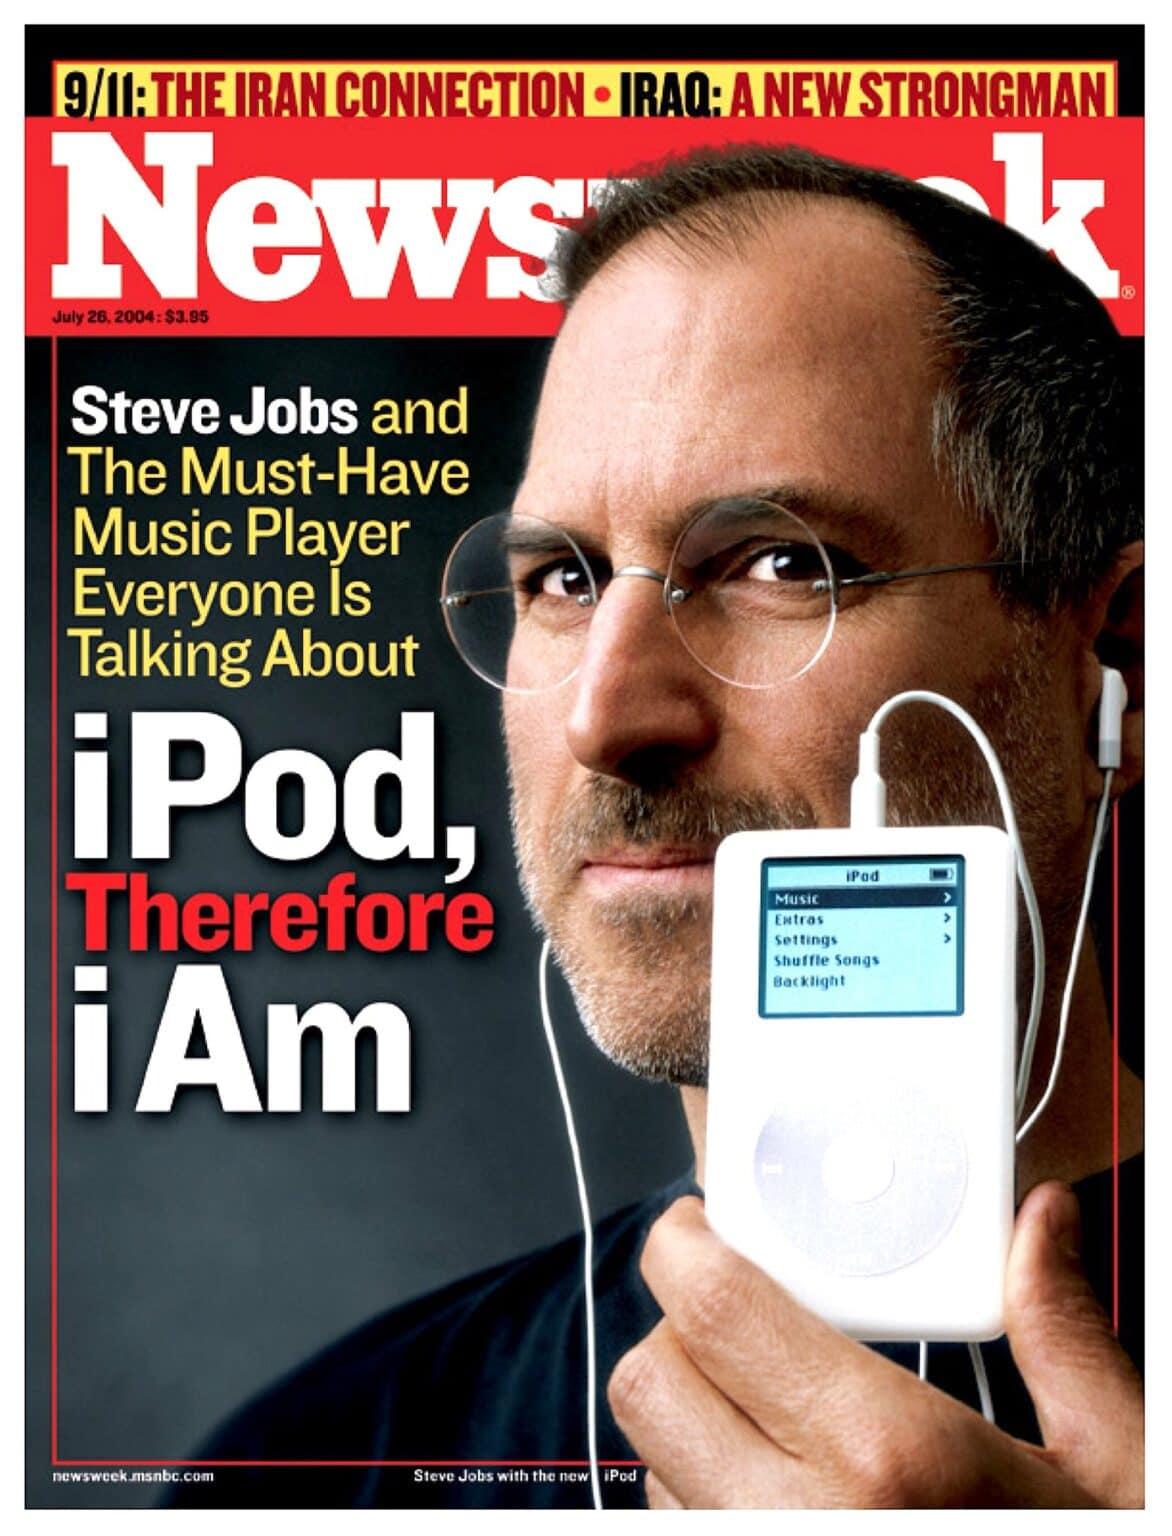 Steve Jobs on the cover of NewsWeek